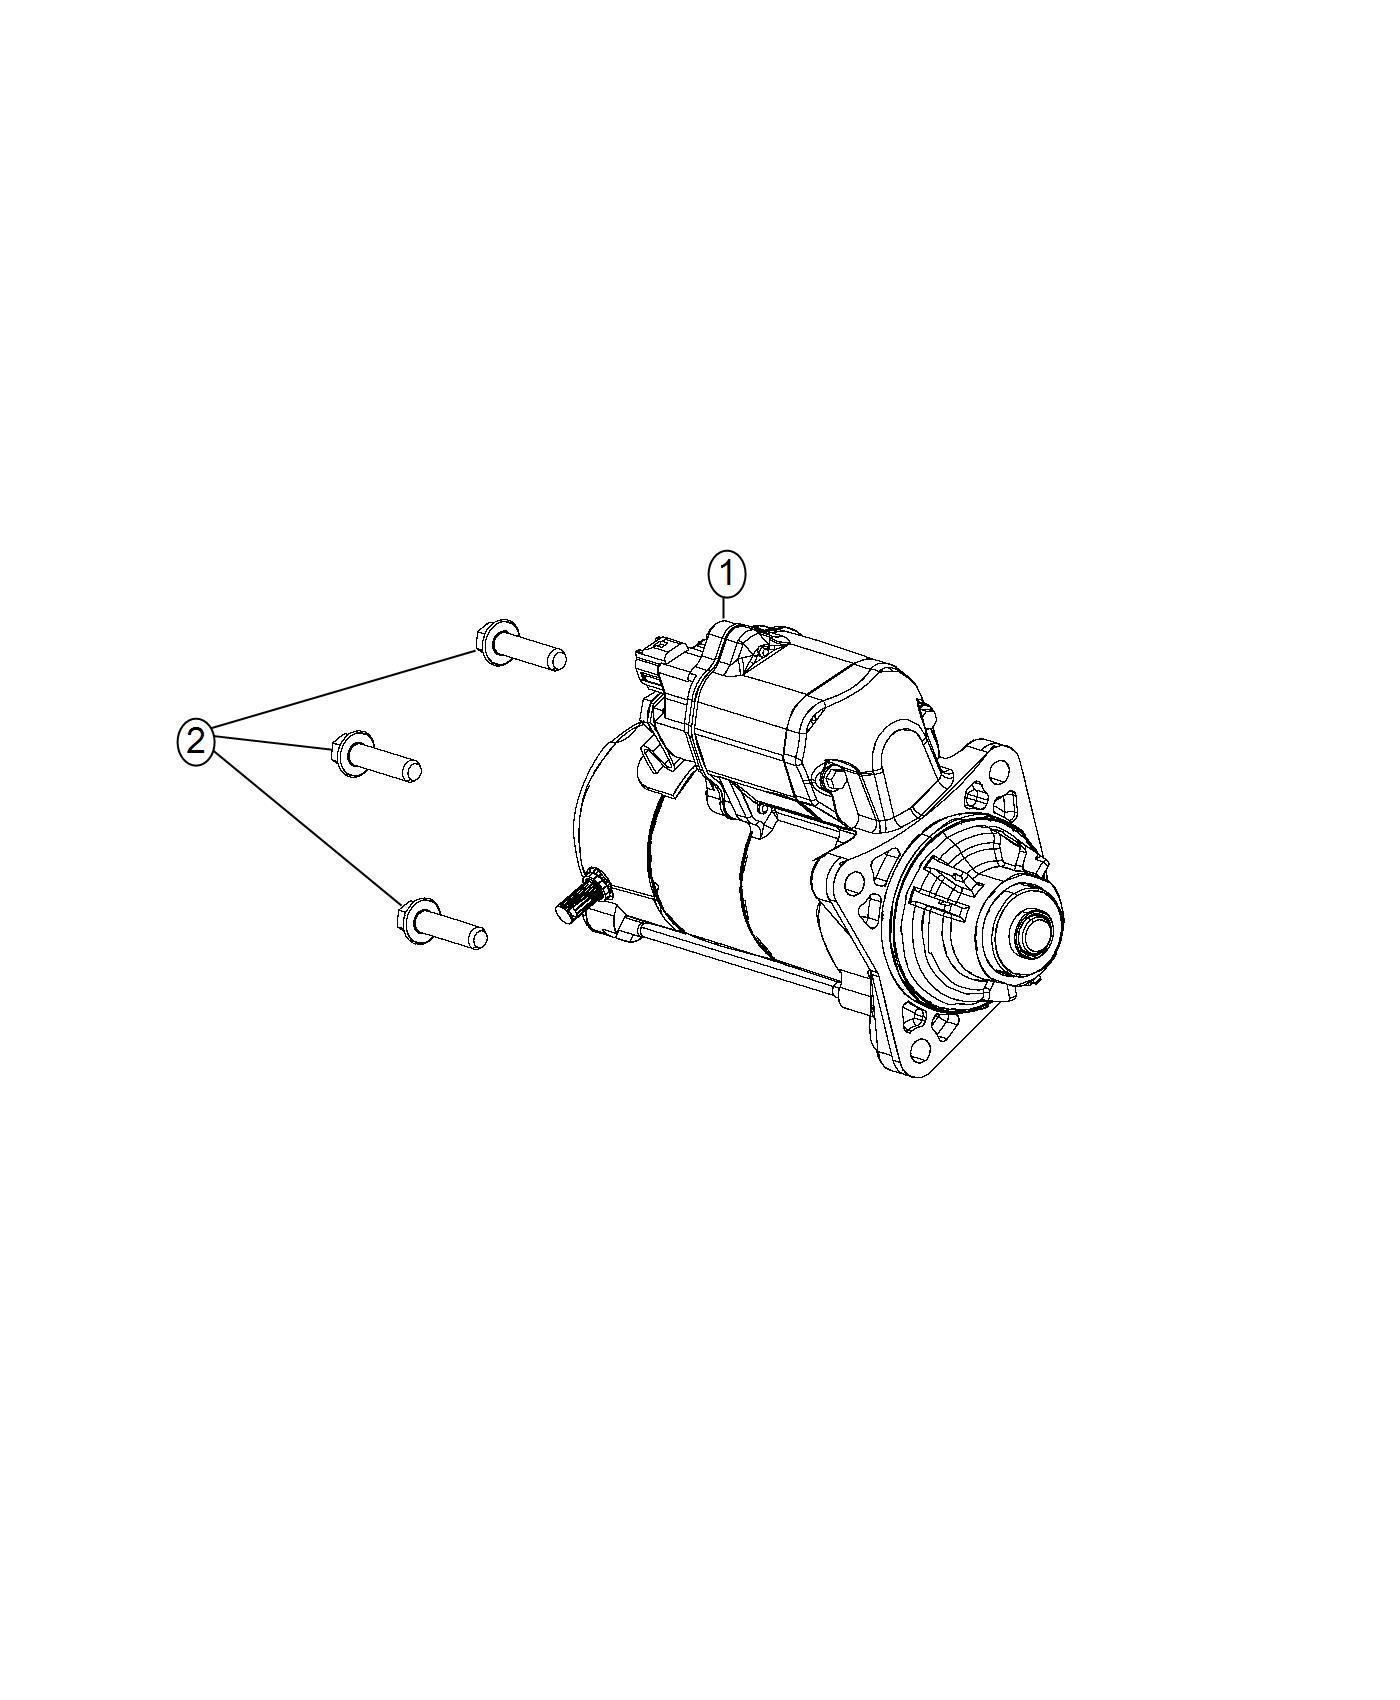 Ram Starter Engine